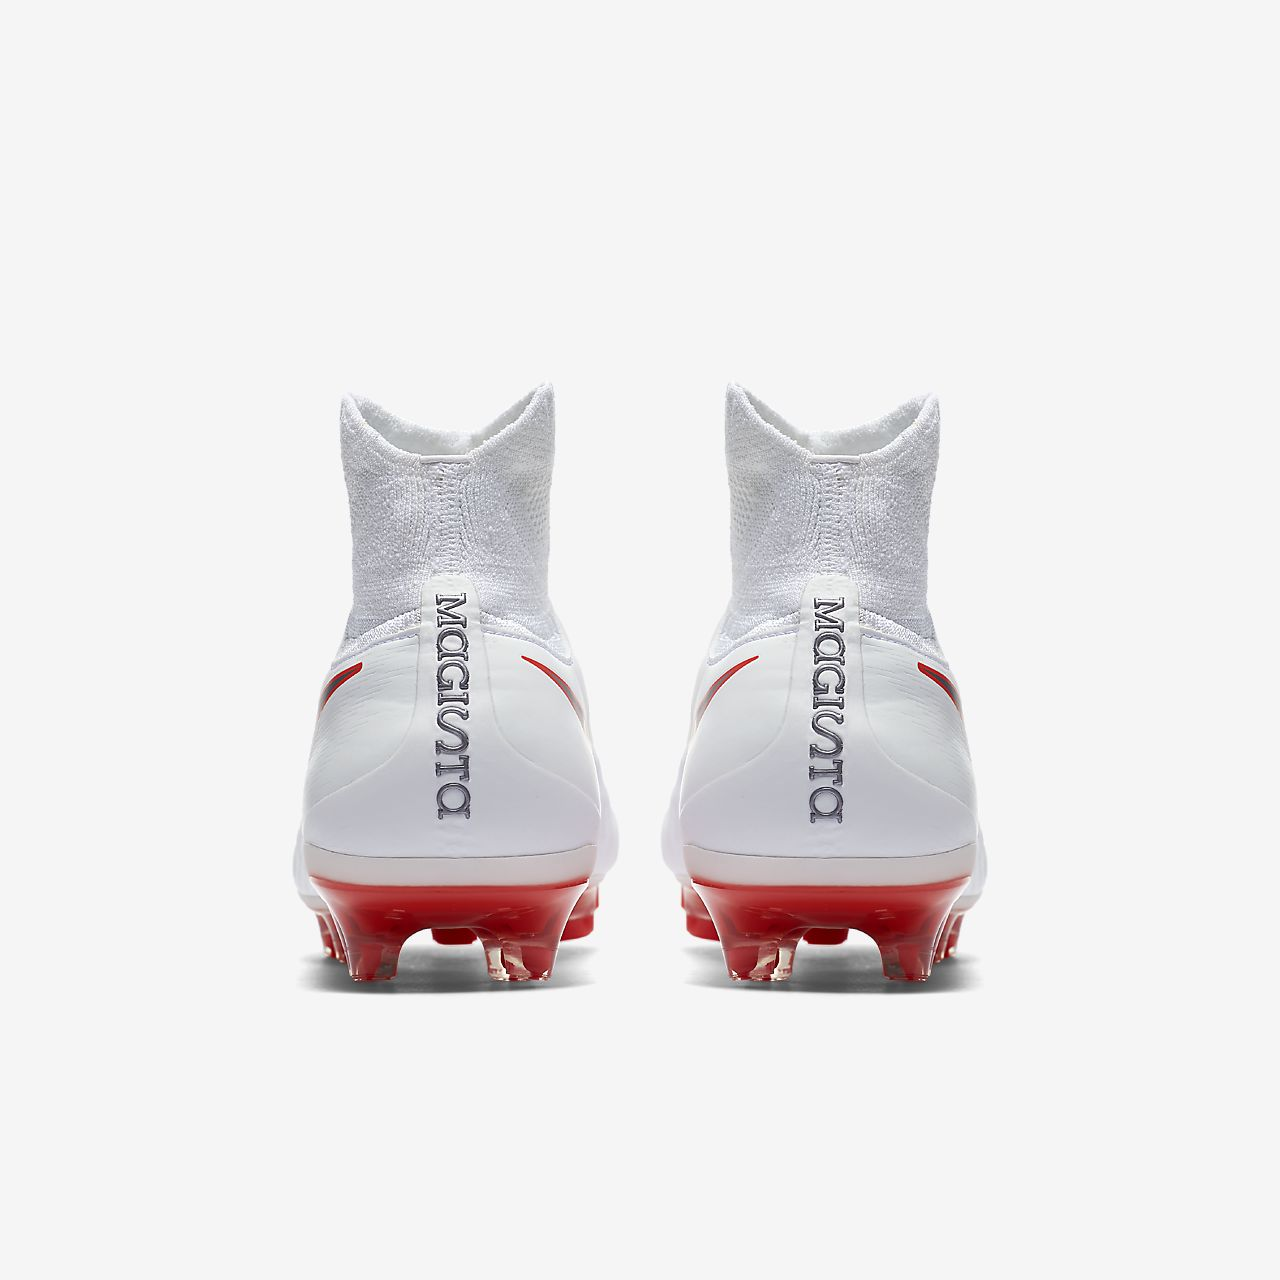 Nike Nike Nike Magista Obra II Pro Dynamic Fit Just Do It Fußballschuh für normalen Rasen Mode Schuhe-AR2579DS    | Erlesene Materialien  908f9b